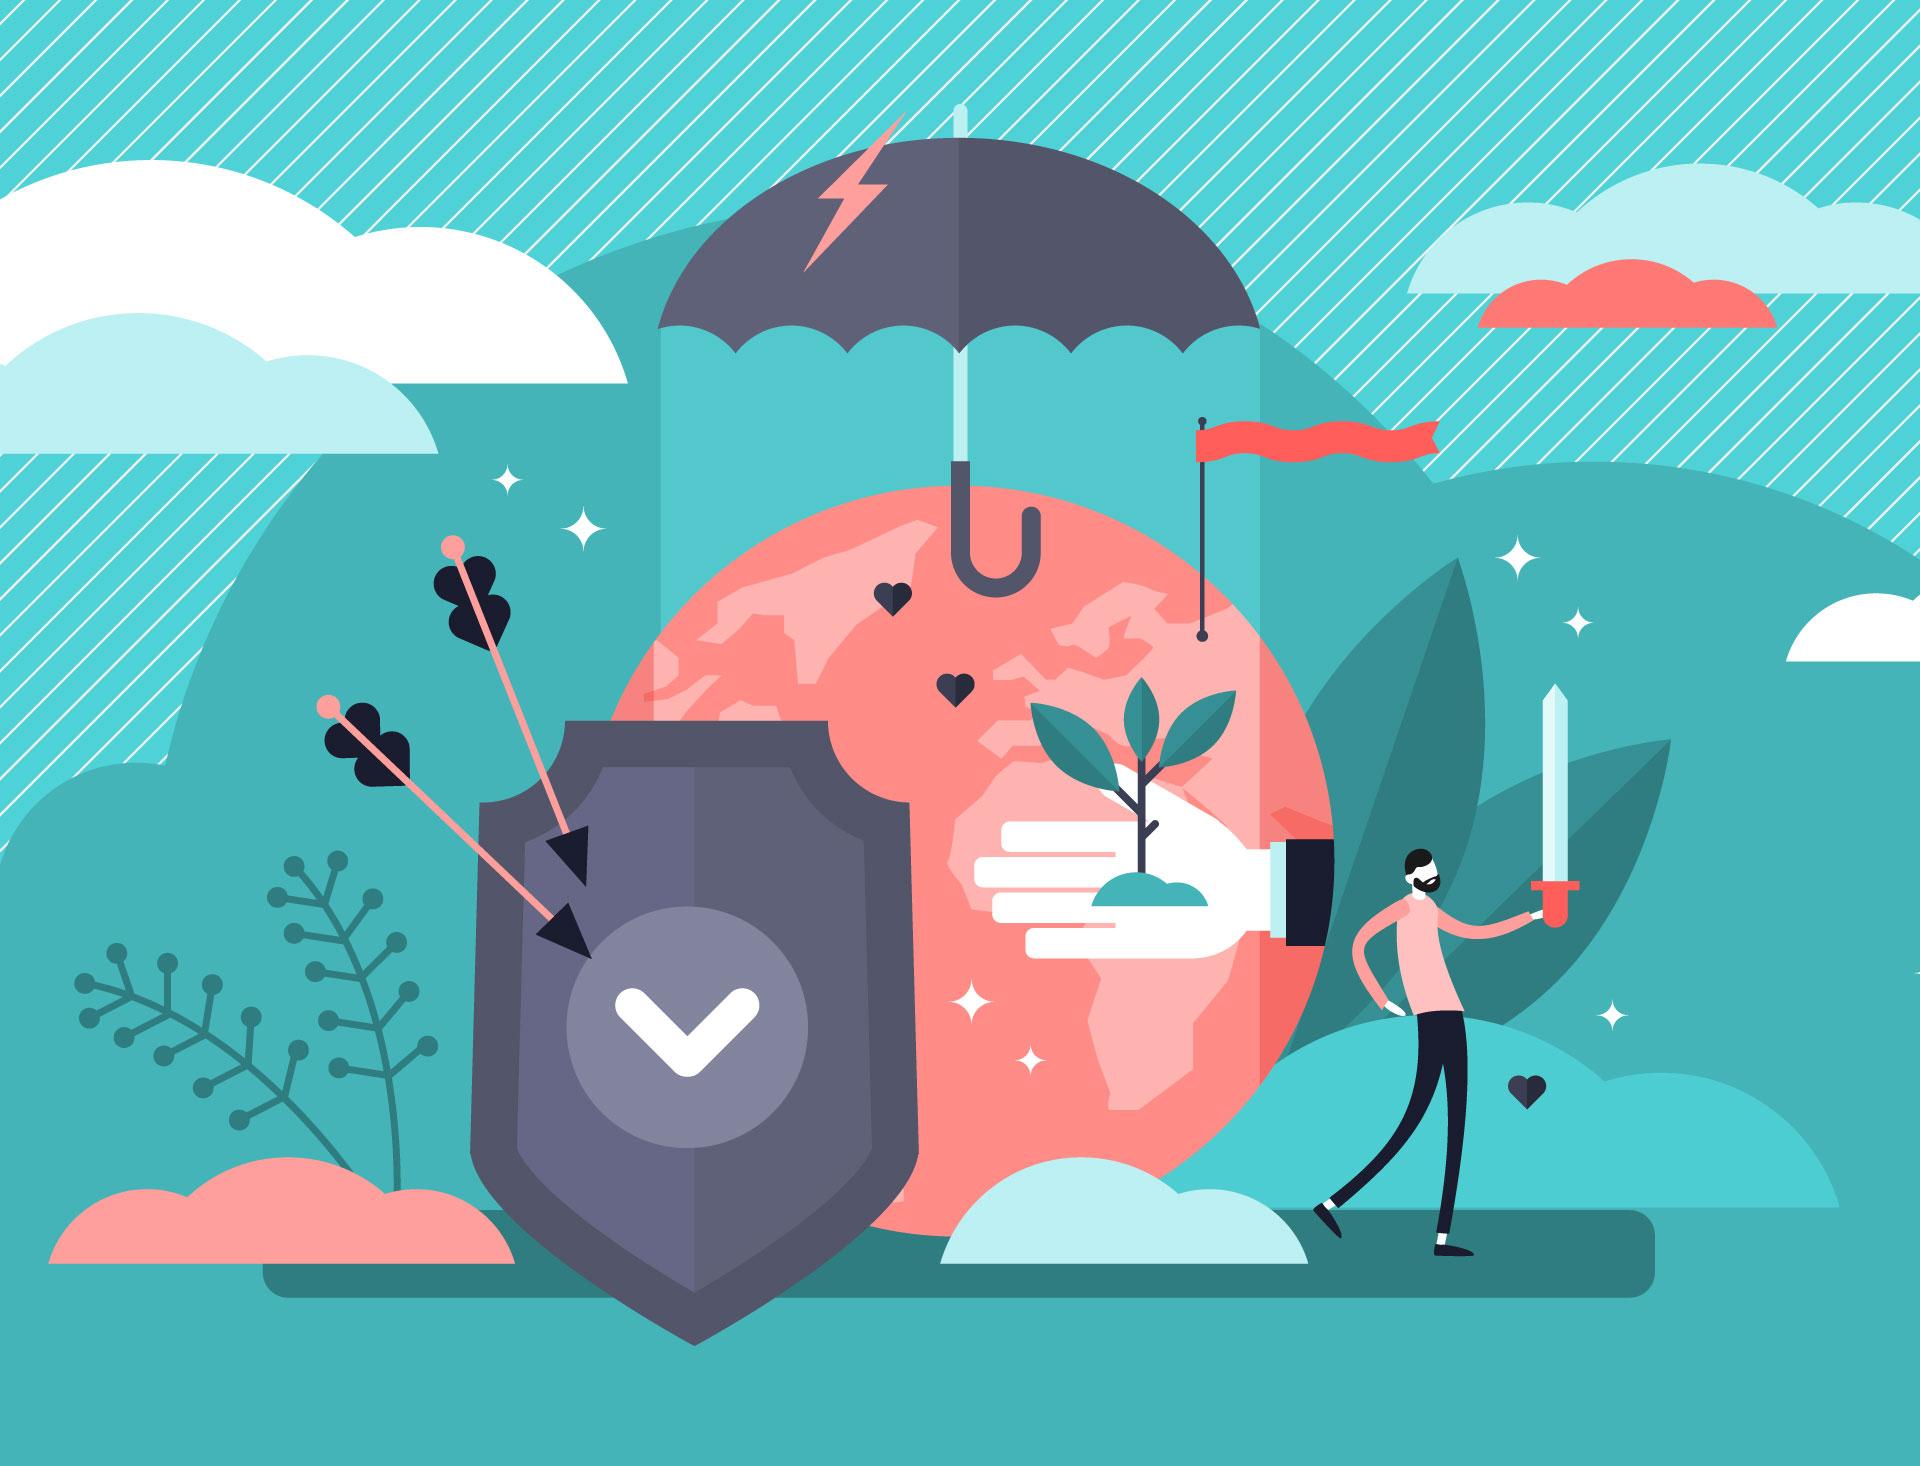 Digital Risks nets $10.4m to disrupt SME insurance market